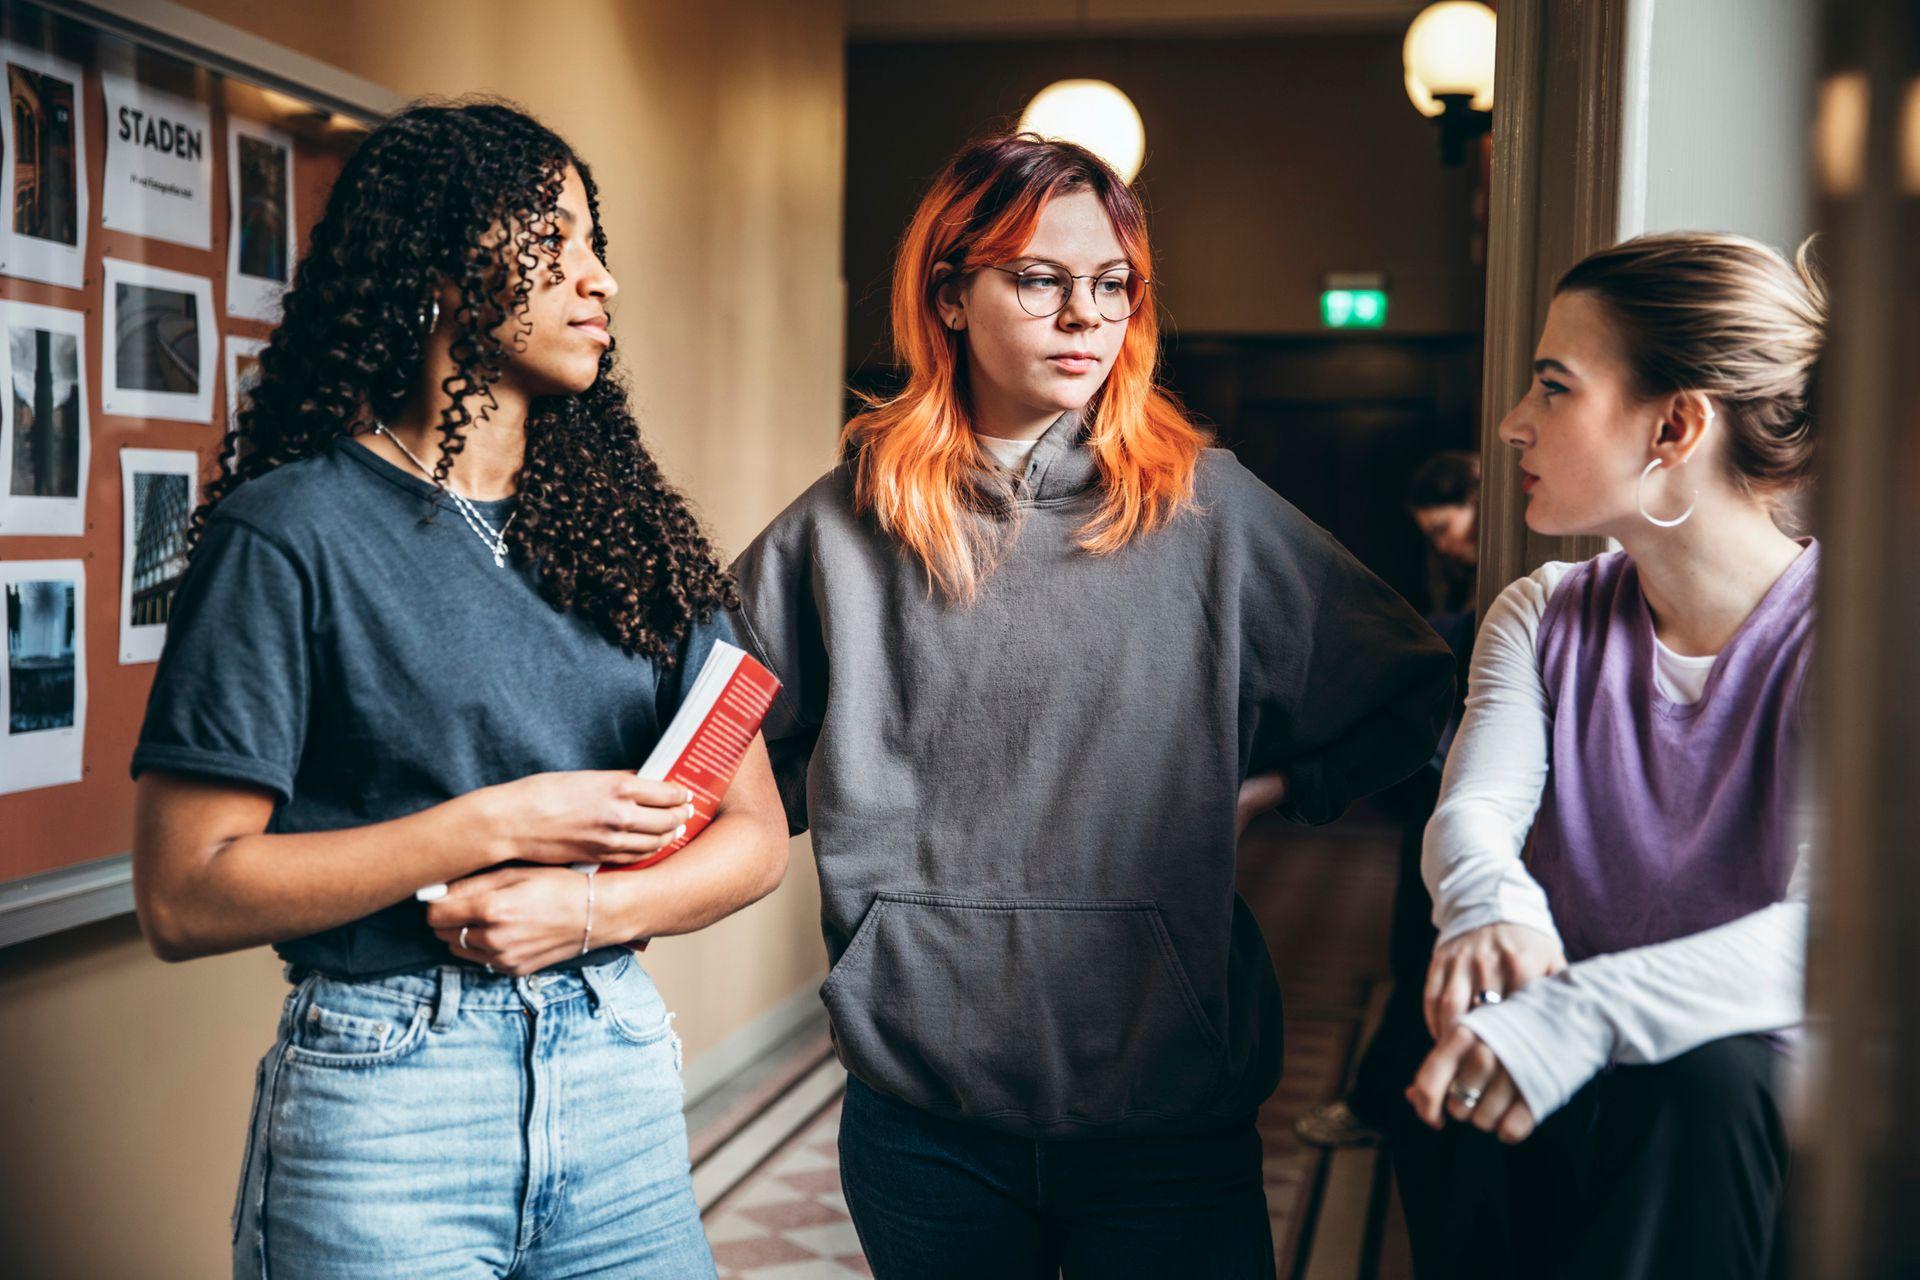 Three teenage girls stand in a hallway, talking.